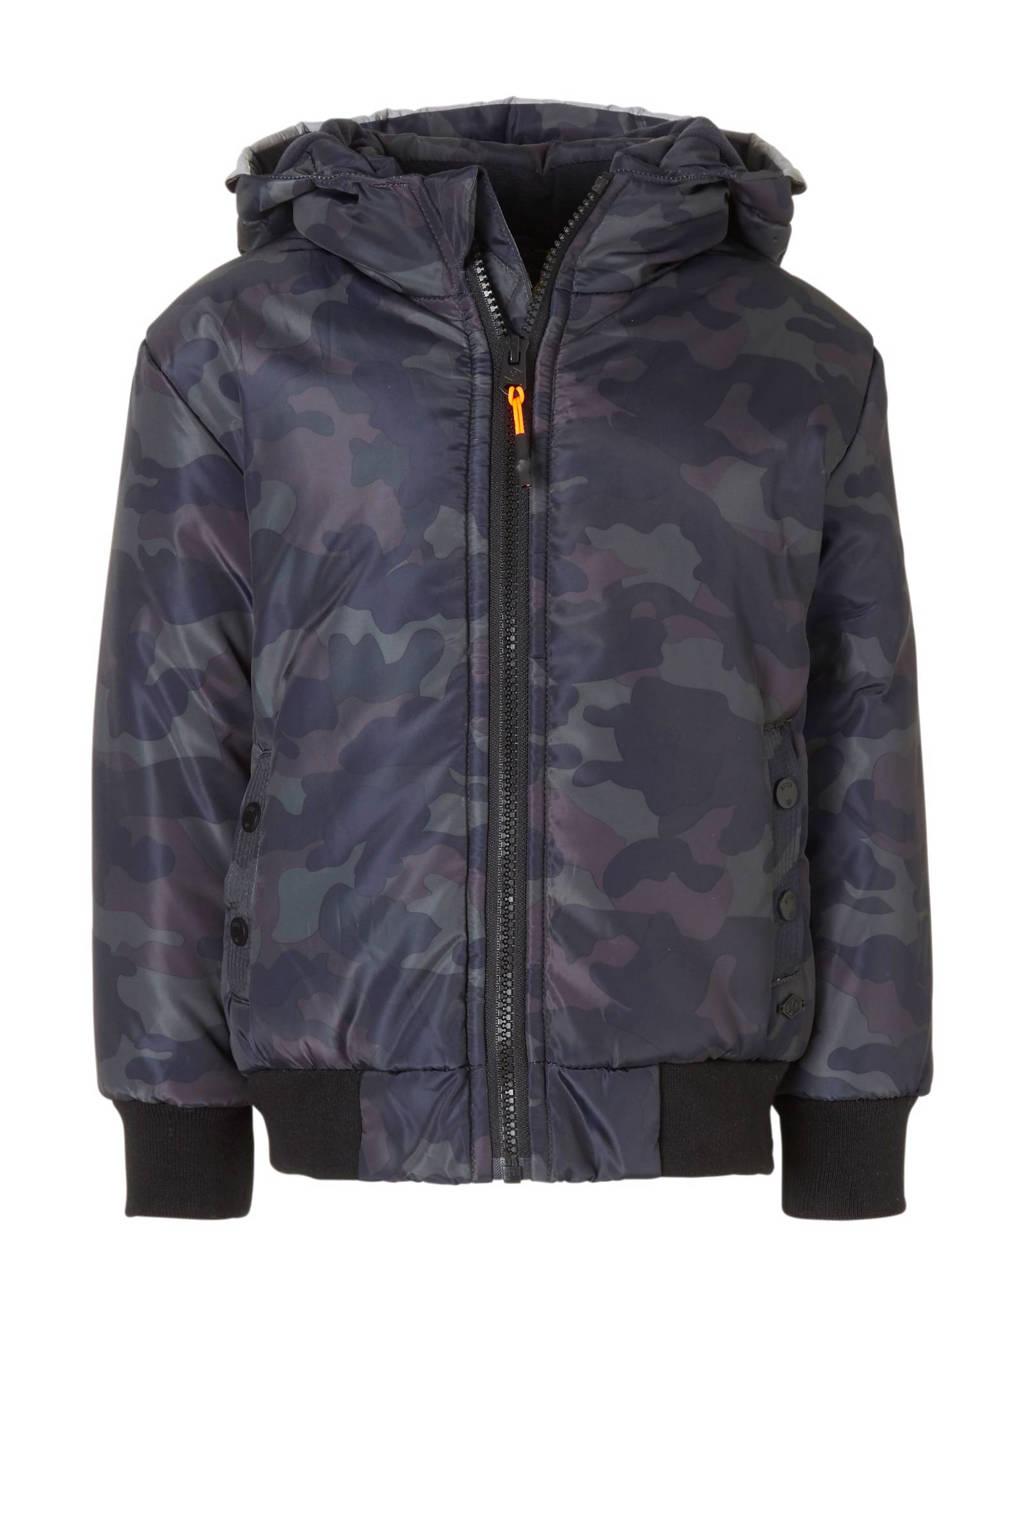 Mitch winterjas met camouflageprint donkerblauw, Donkerblauw/kaki